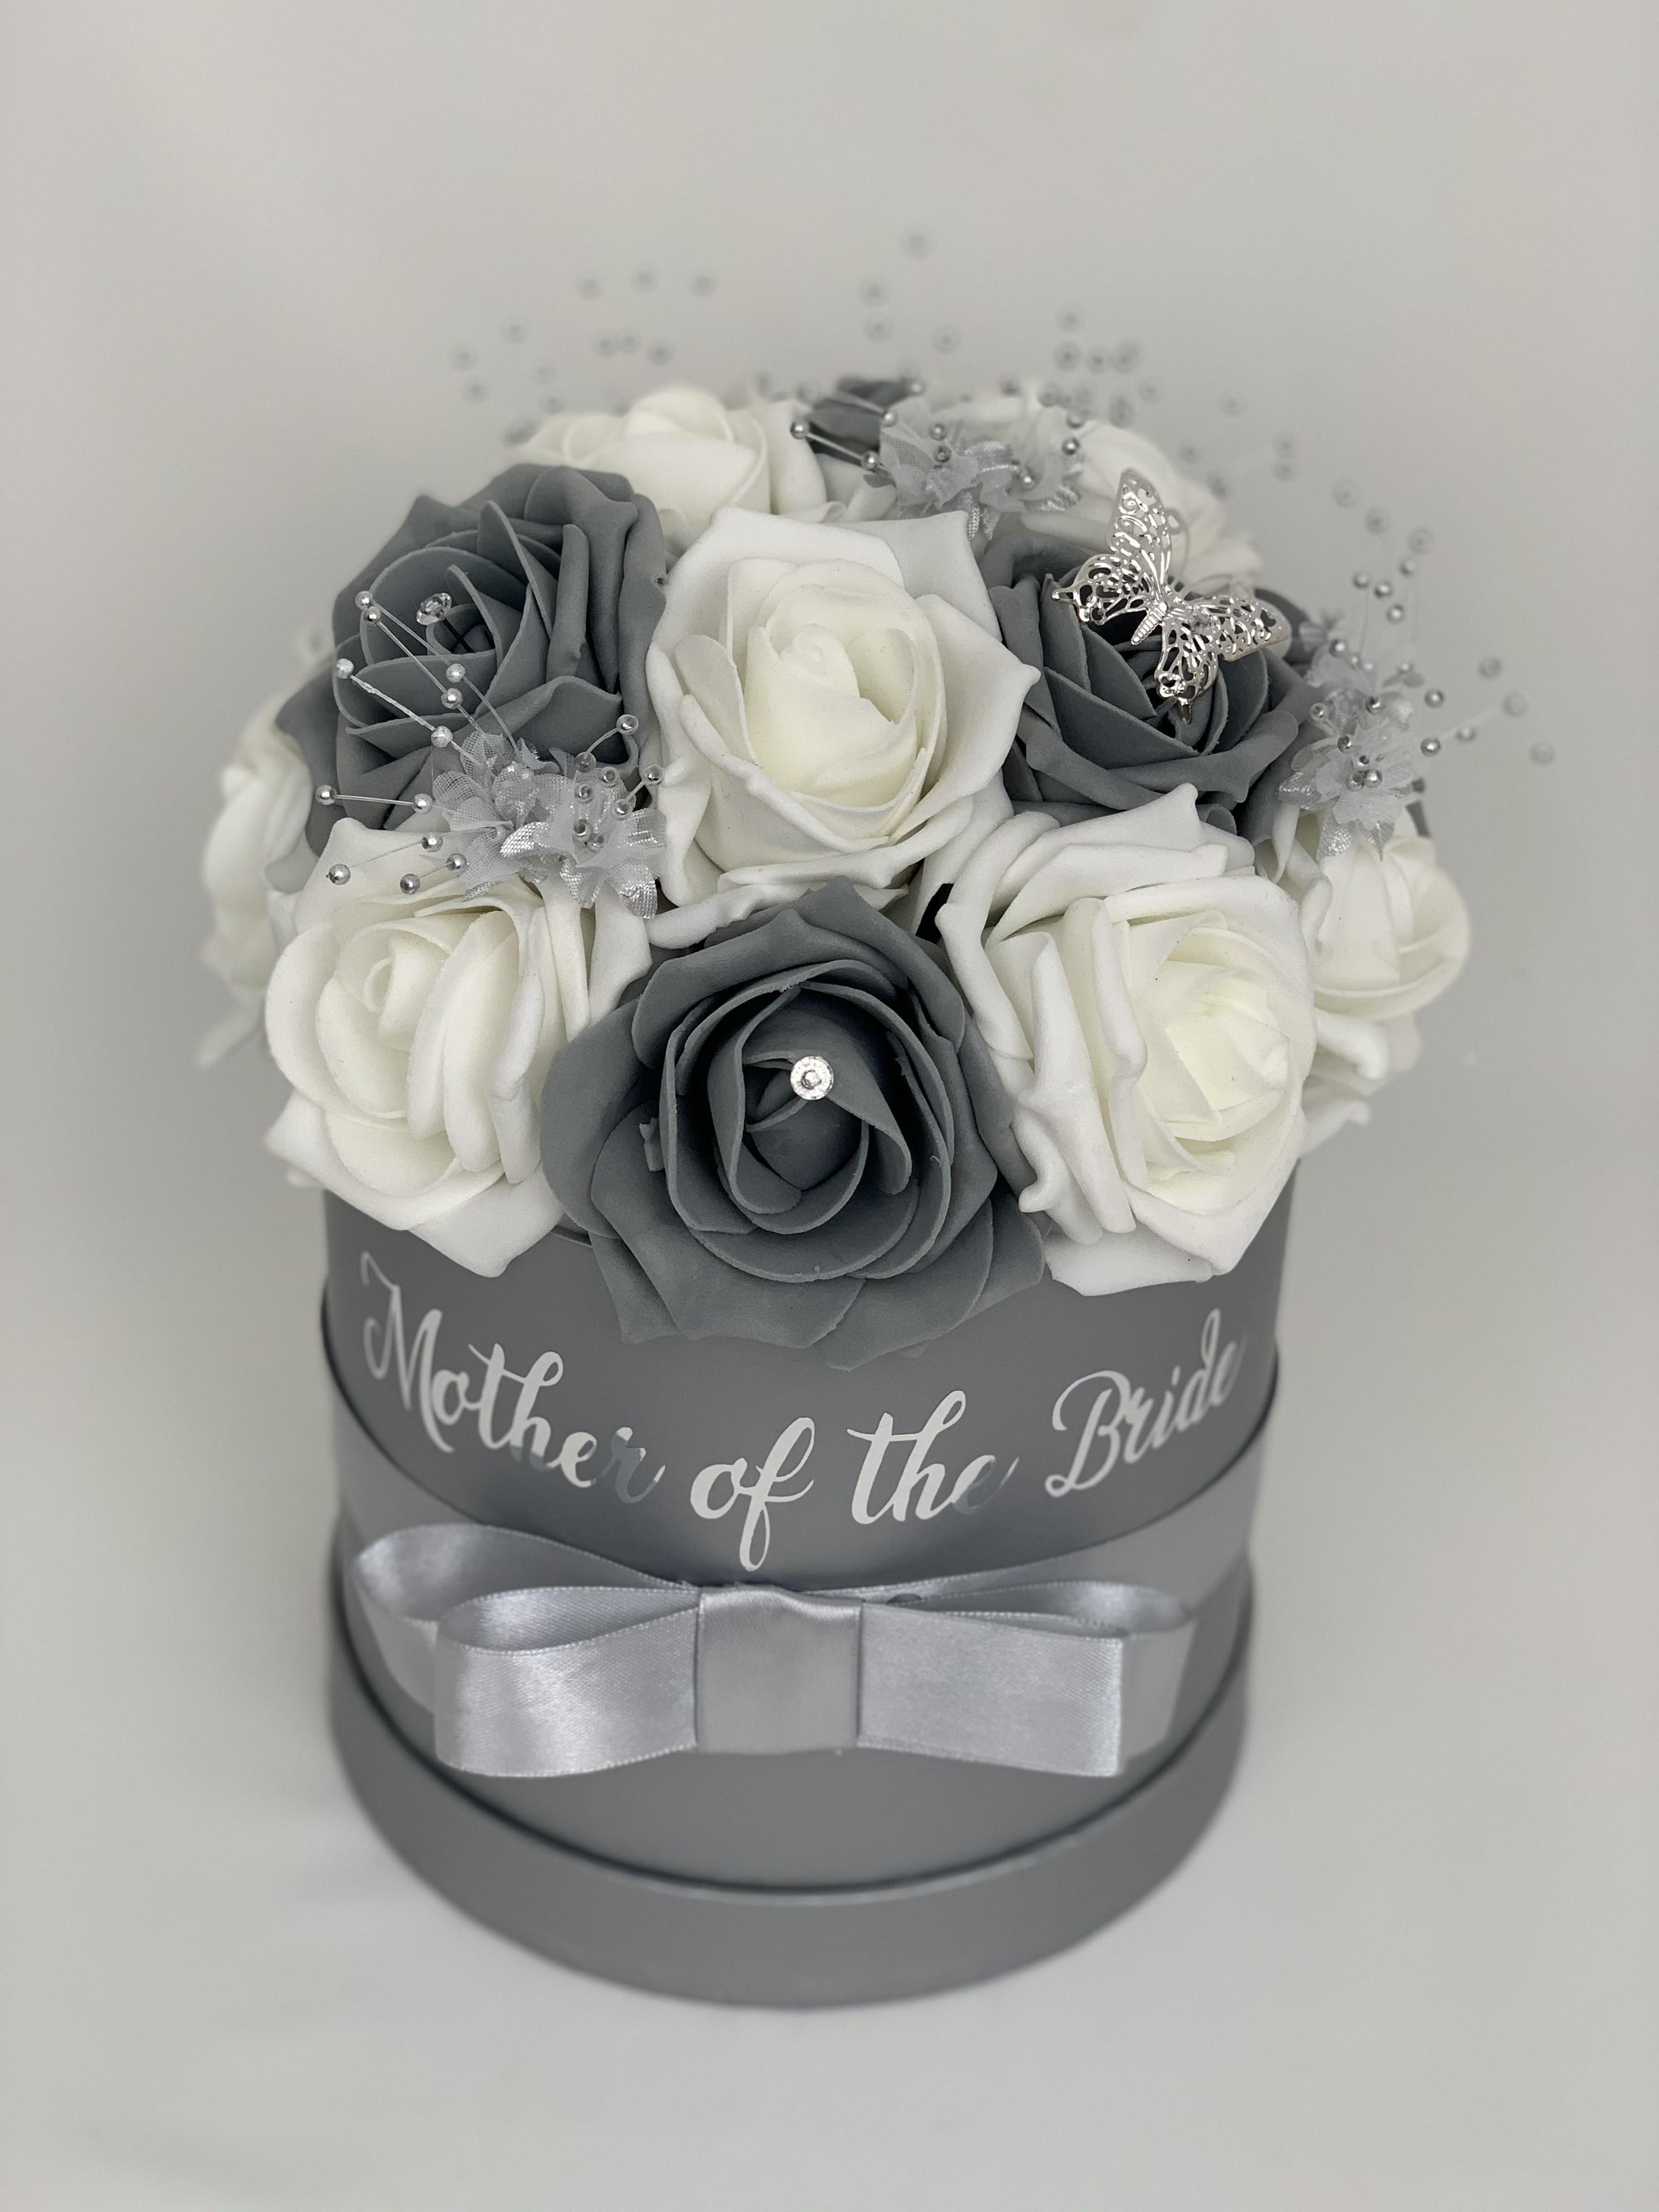 Artificial Flowers Gift Hat Box Medium Diamante Ribbons